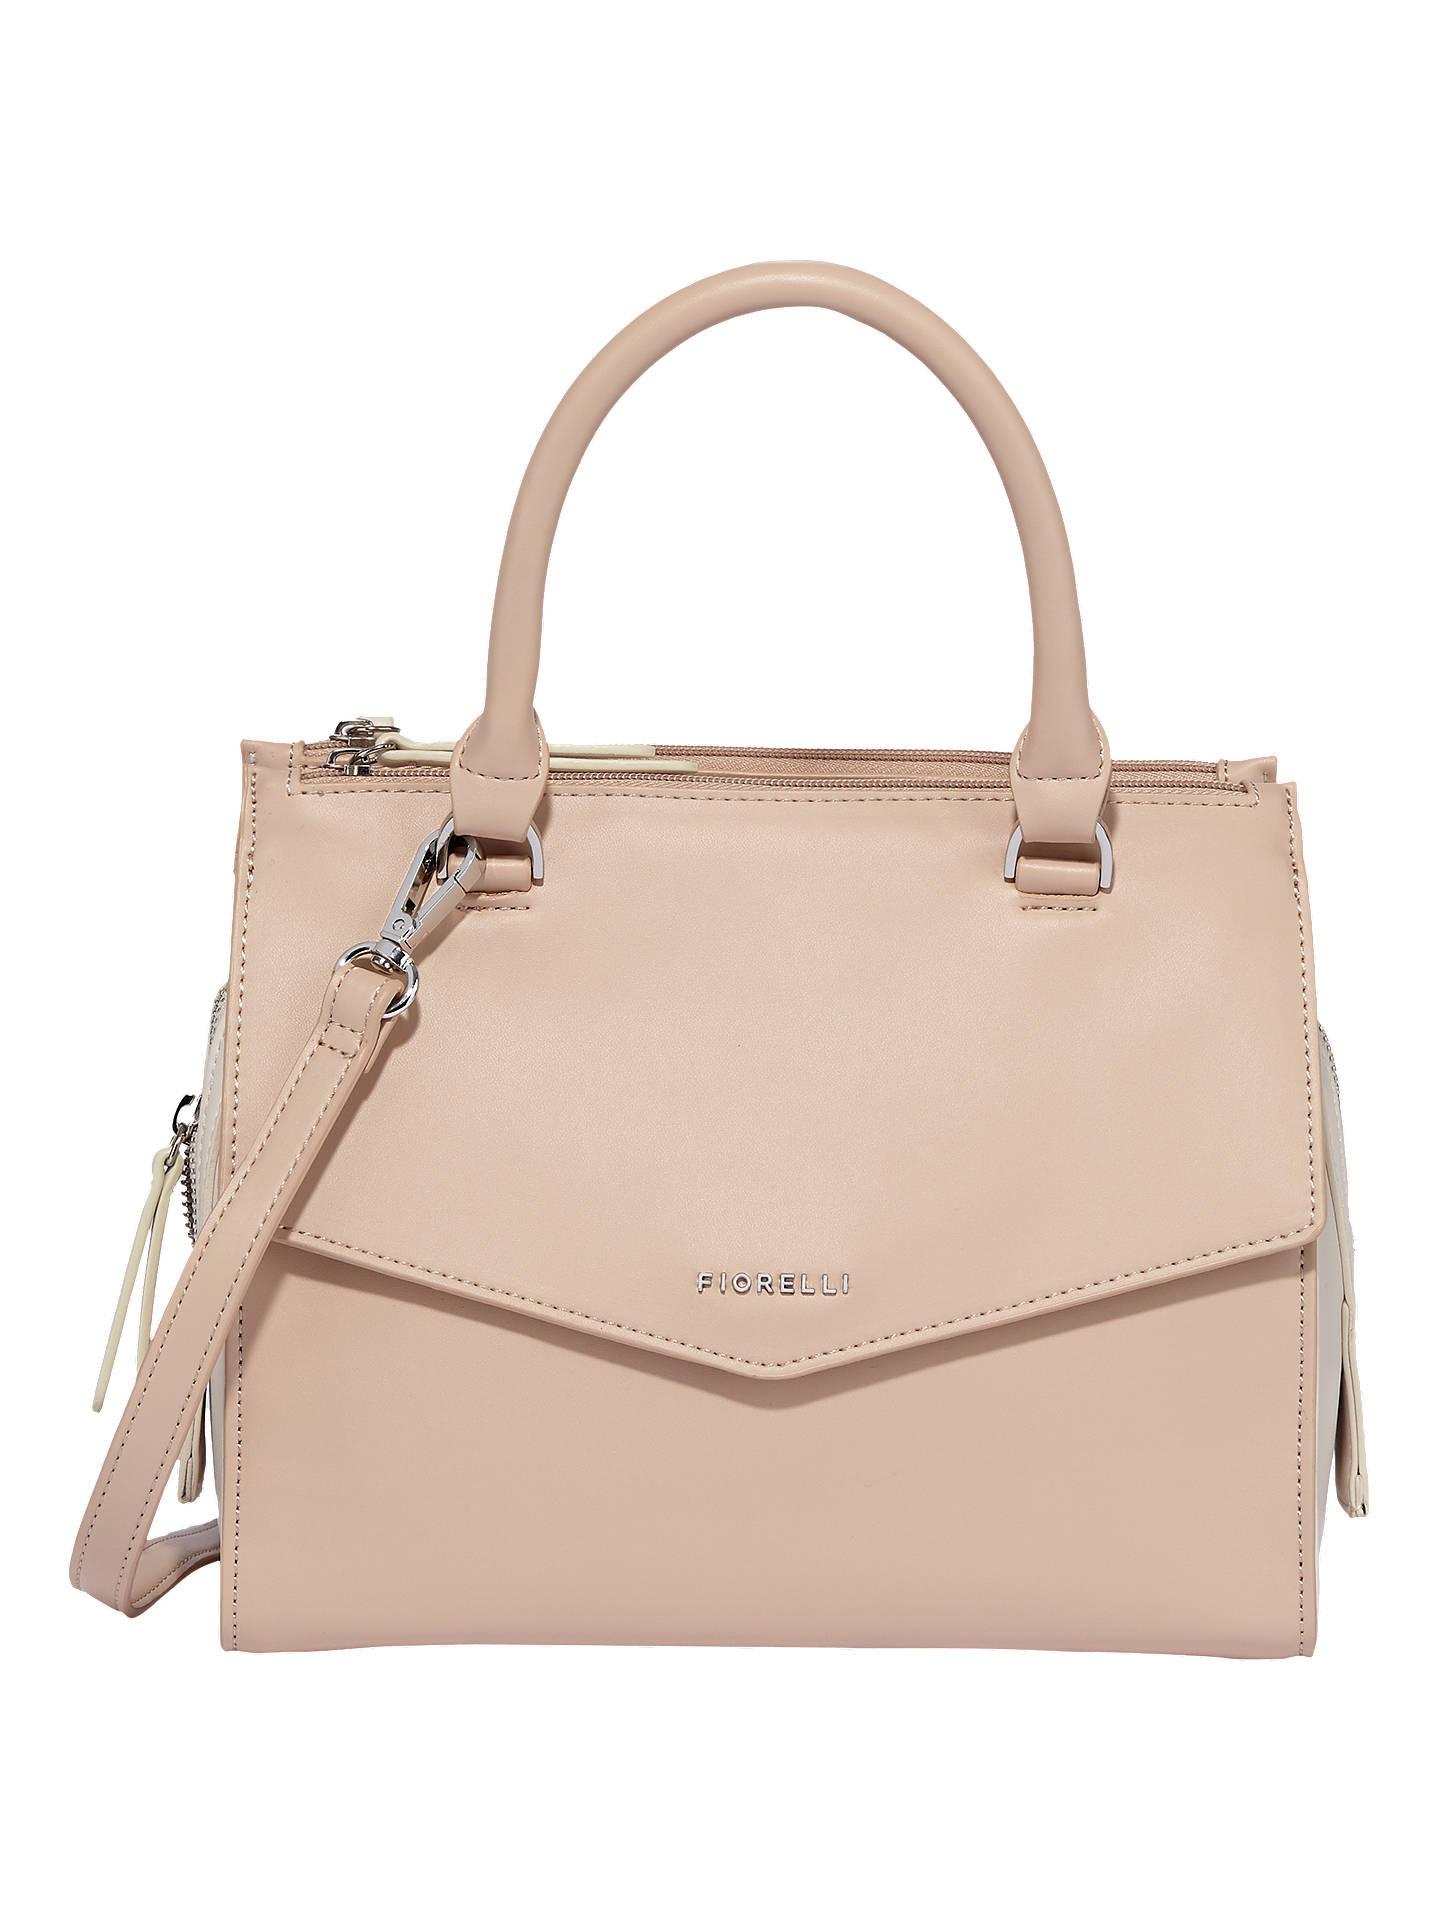 Fiorelli Mia Grab Bag Online At Johnlewis